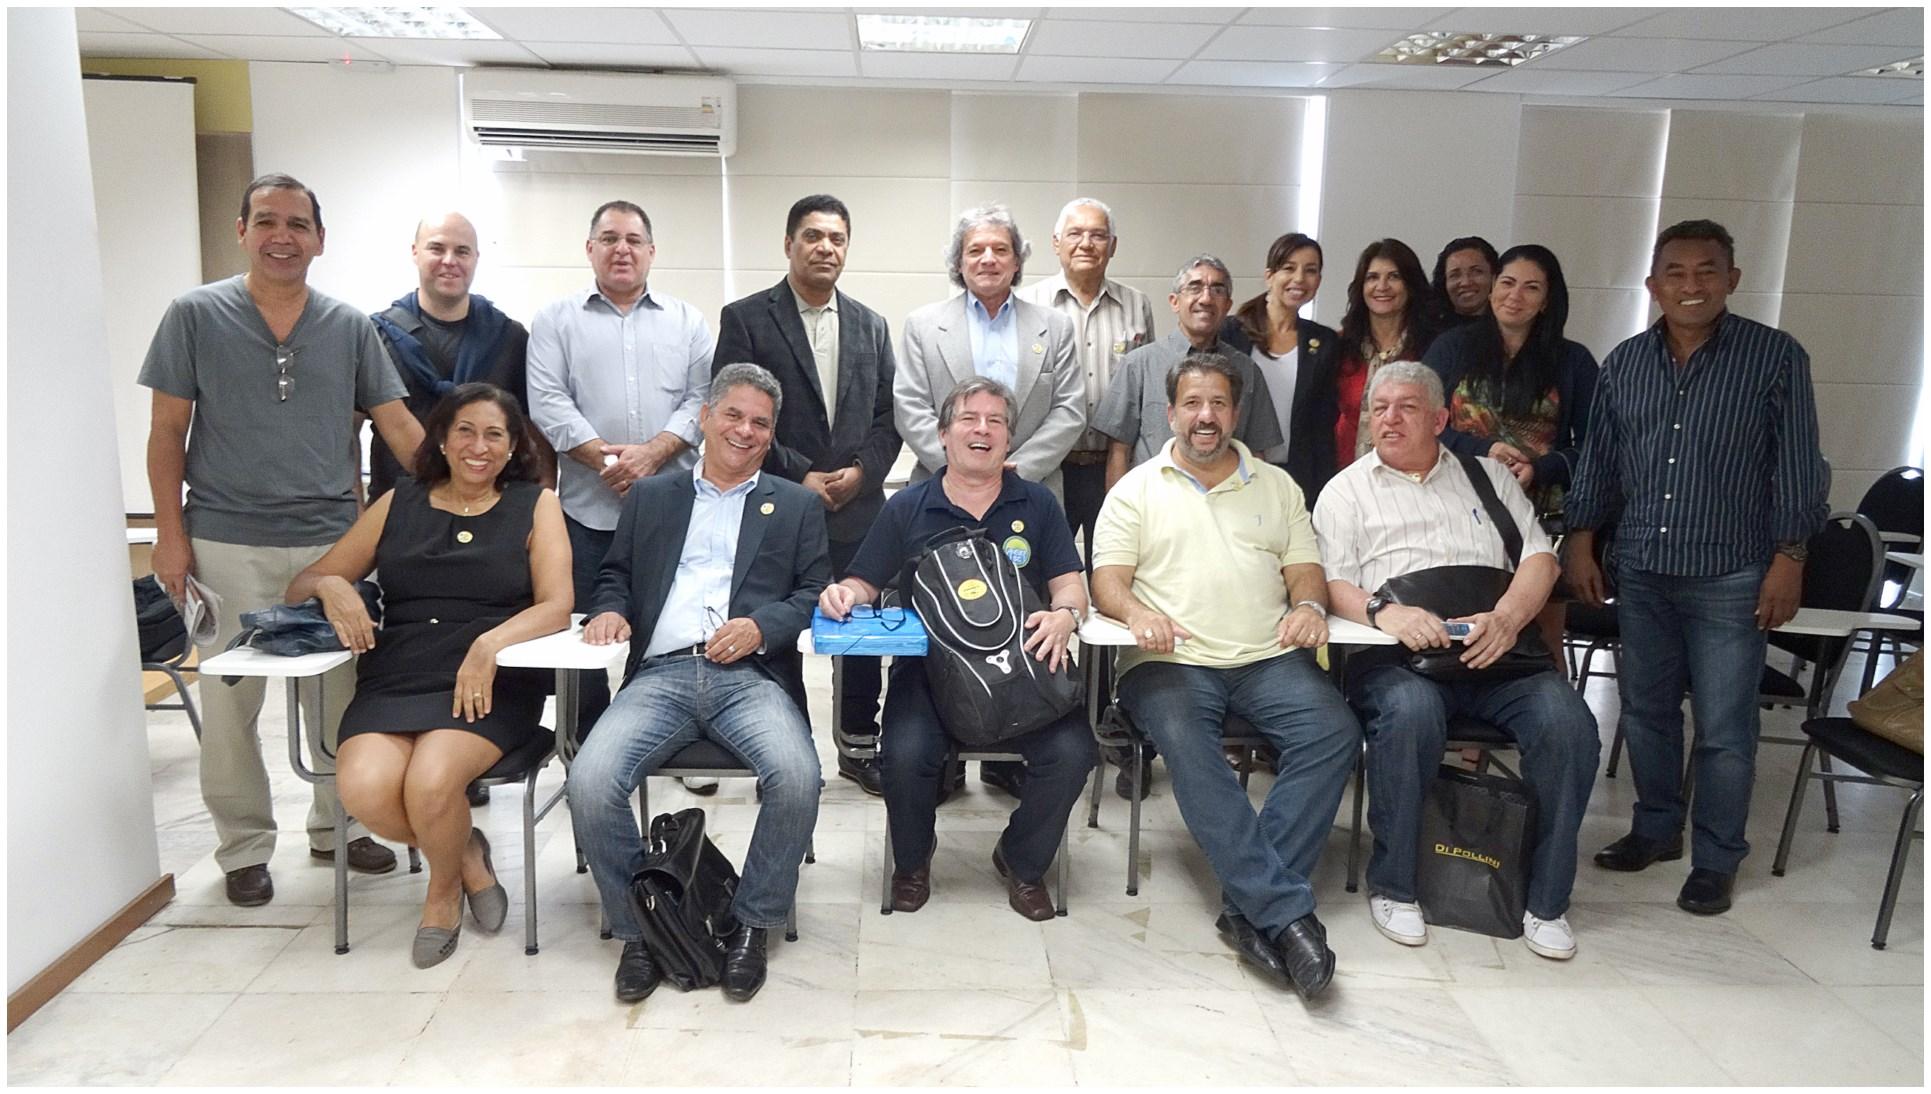 20150515 ago brasilia- 1a